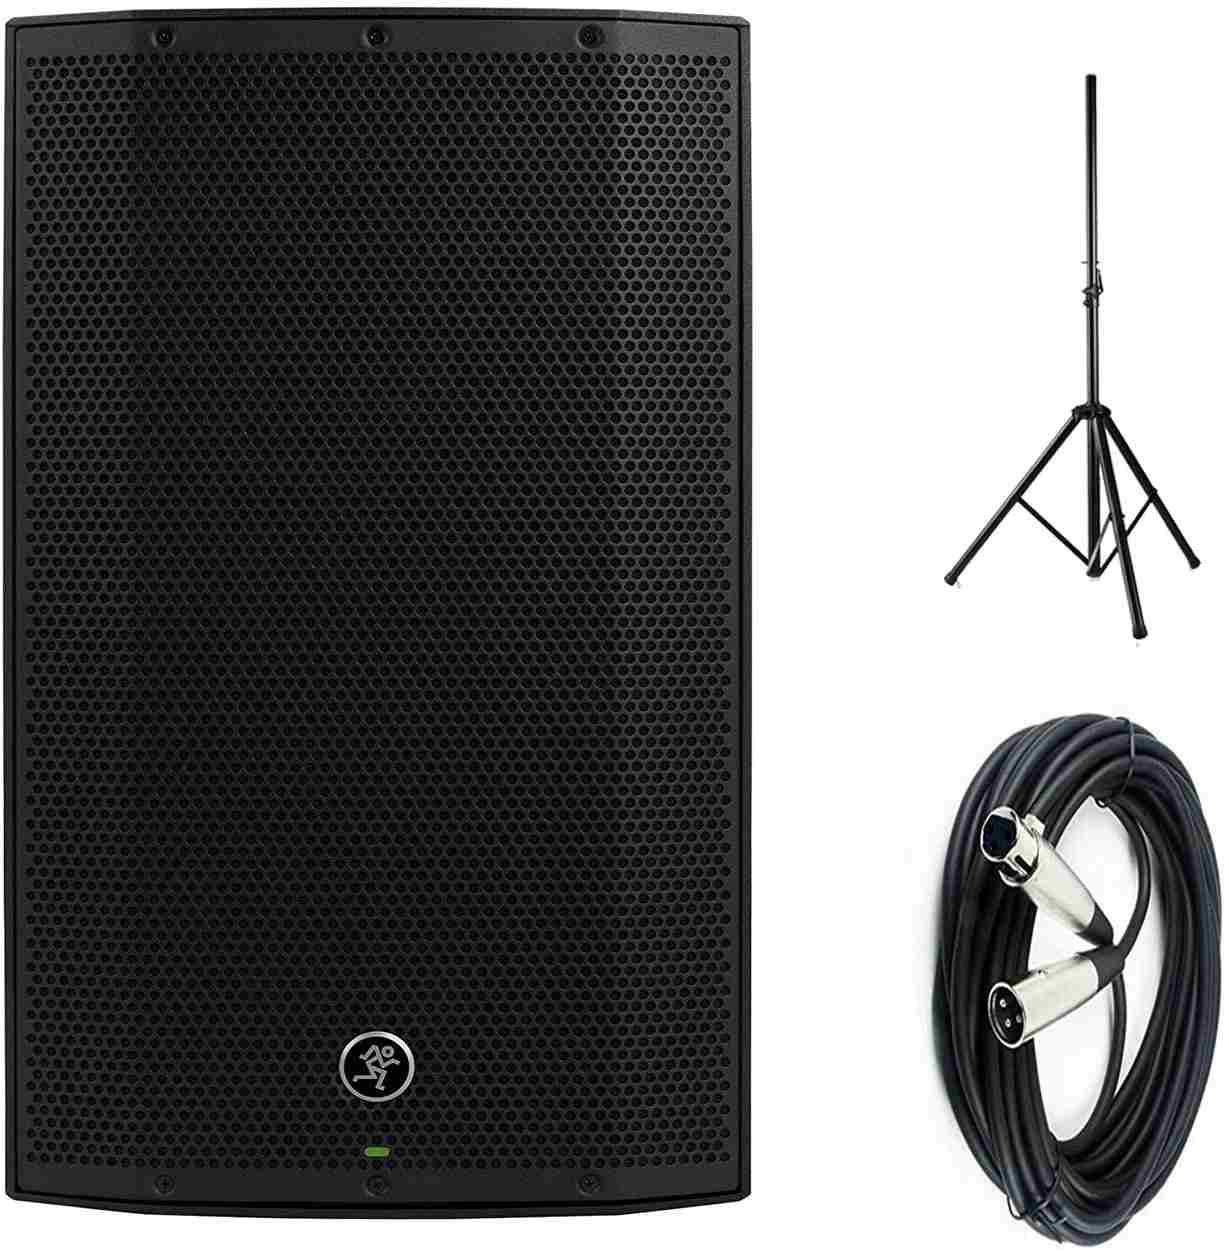 Mackie - best powered speaker for live sound